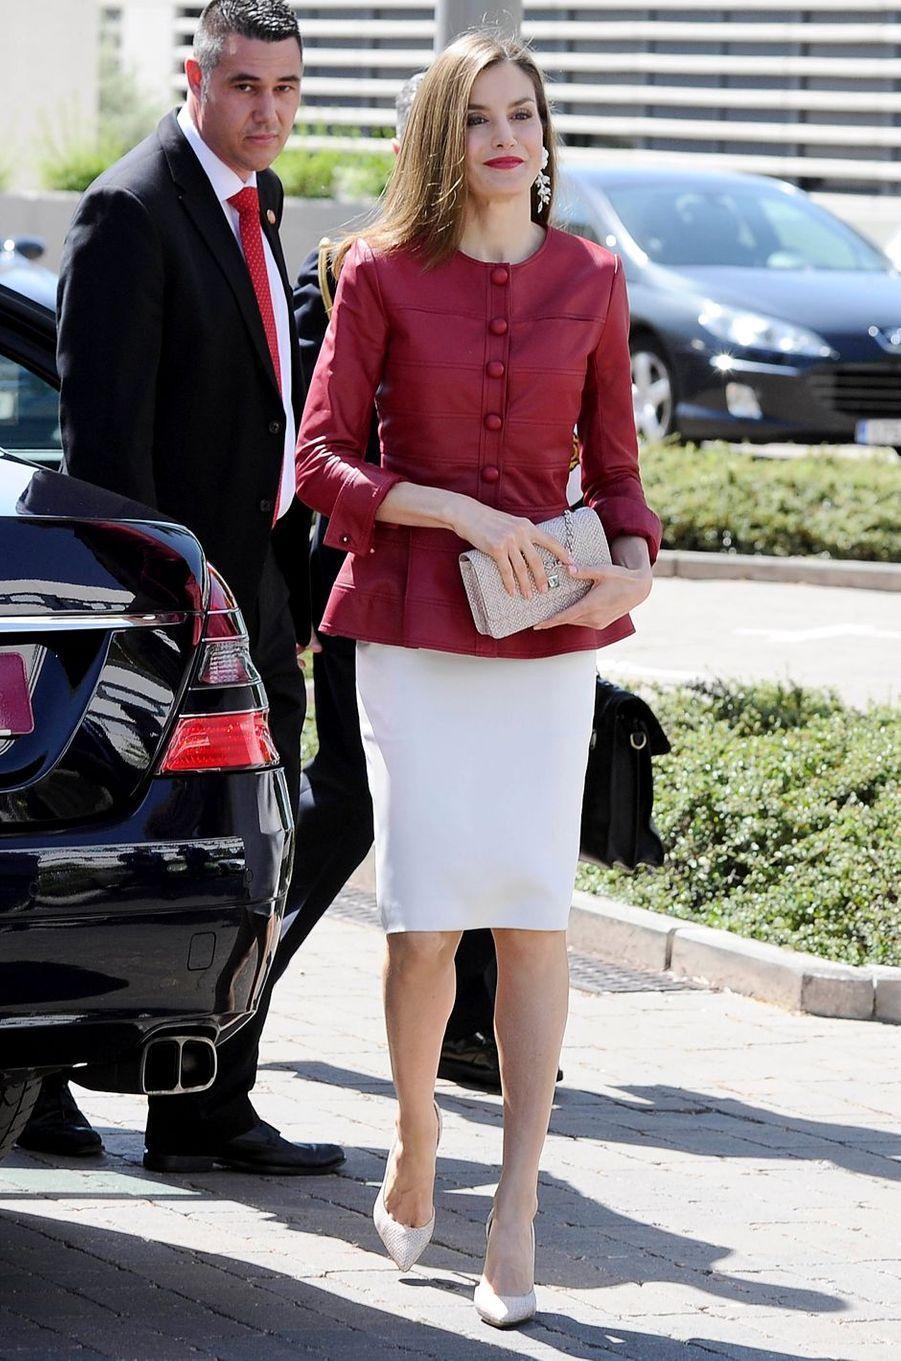 La reine Letizia d'Espagne dans une veste Carolina Herrera, le 22 mai 2017